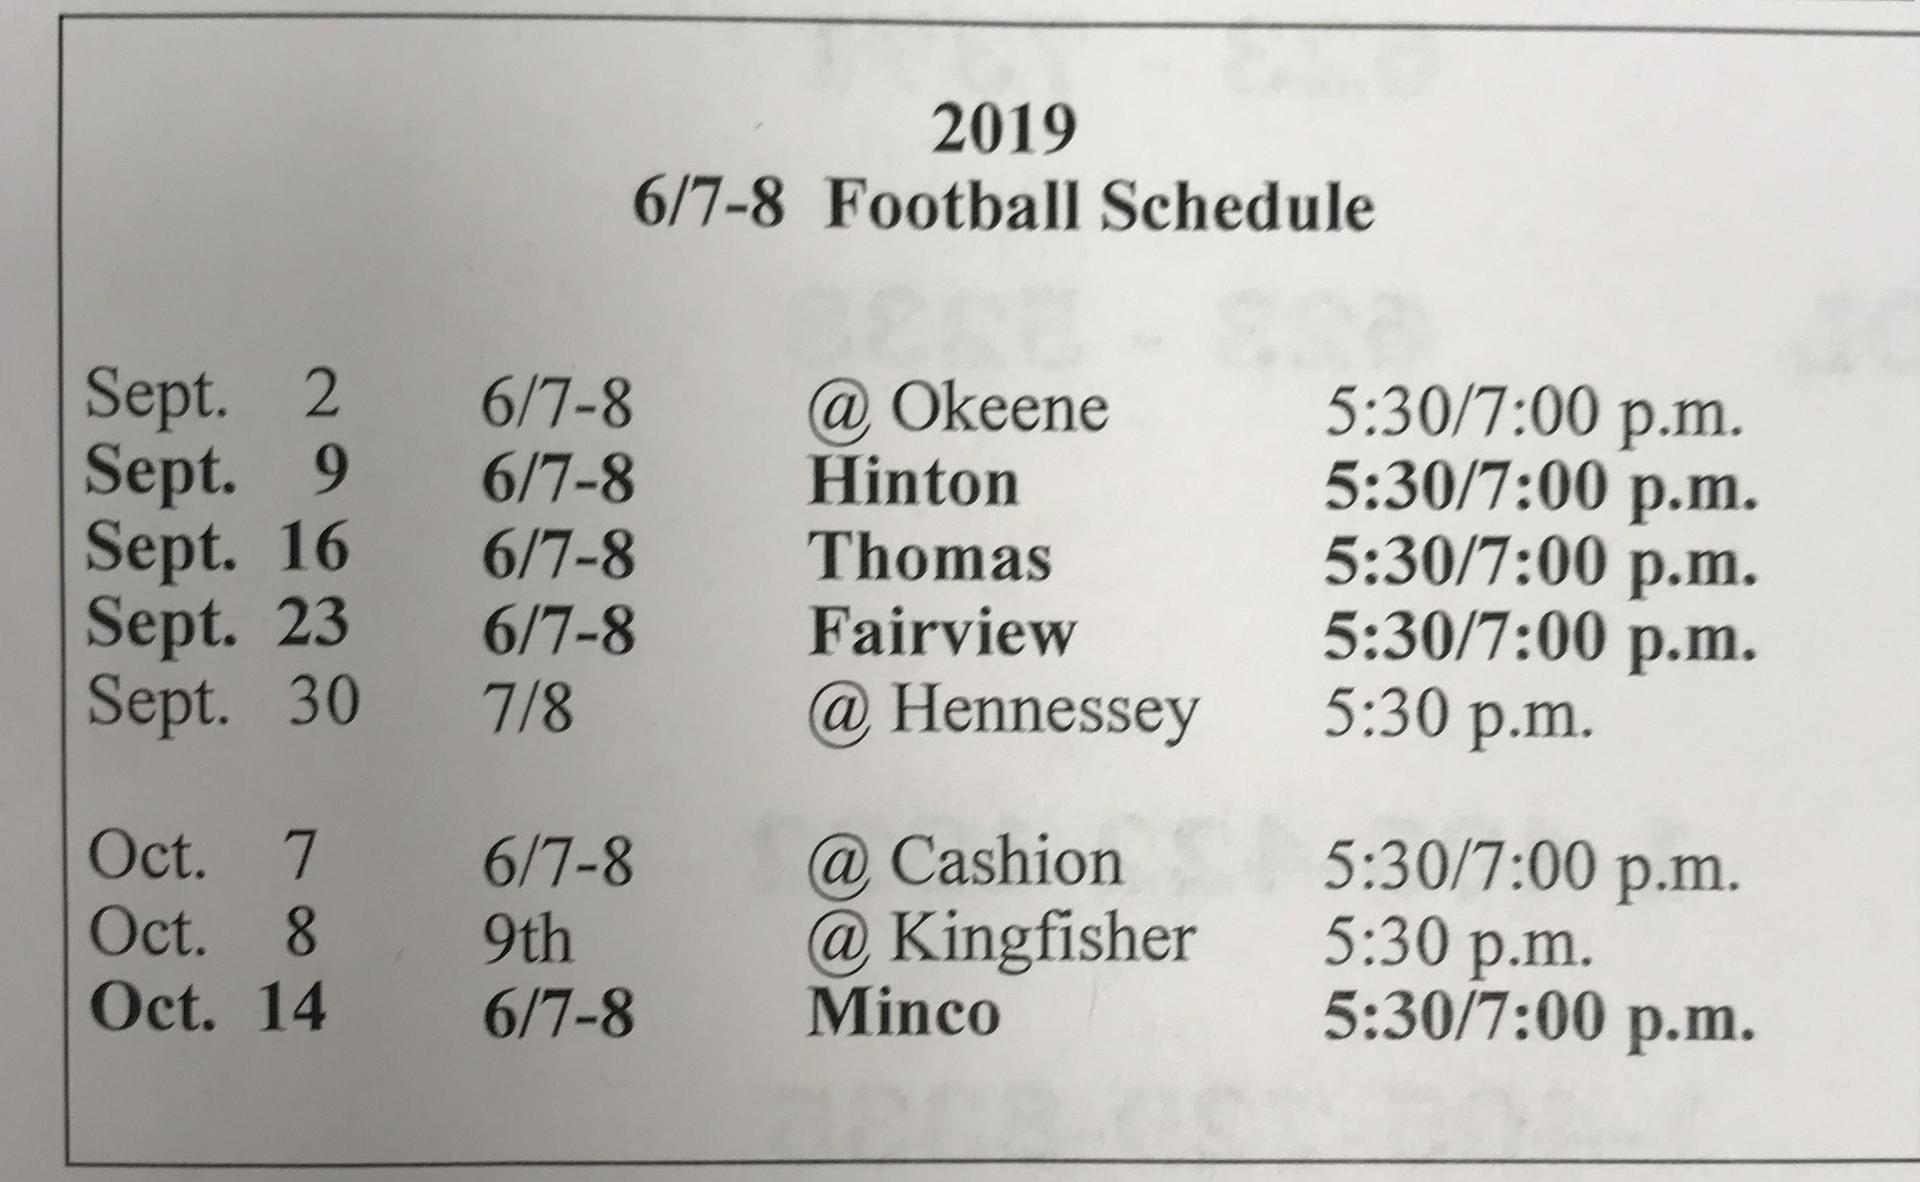 6/7/8th Football